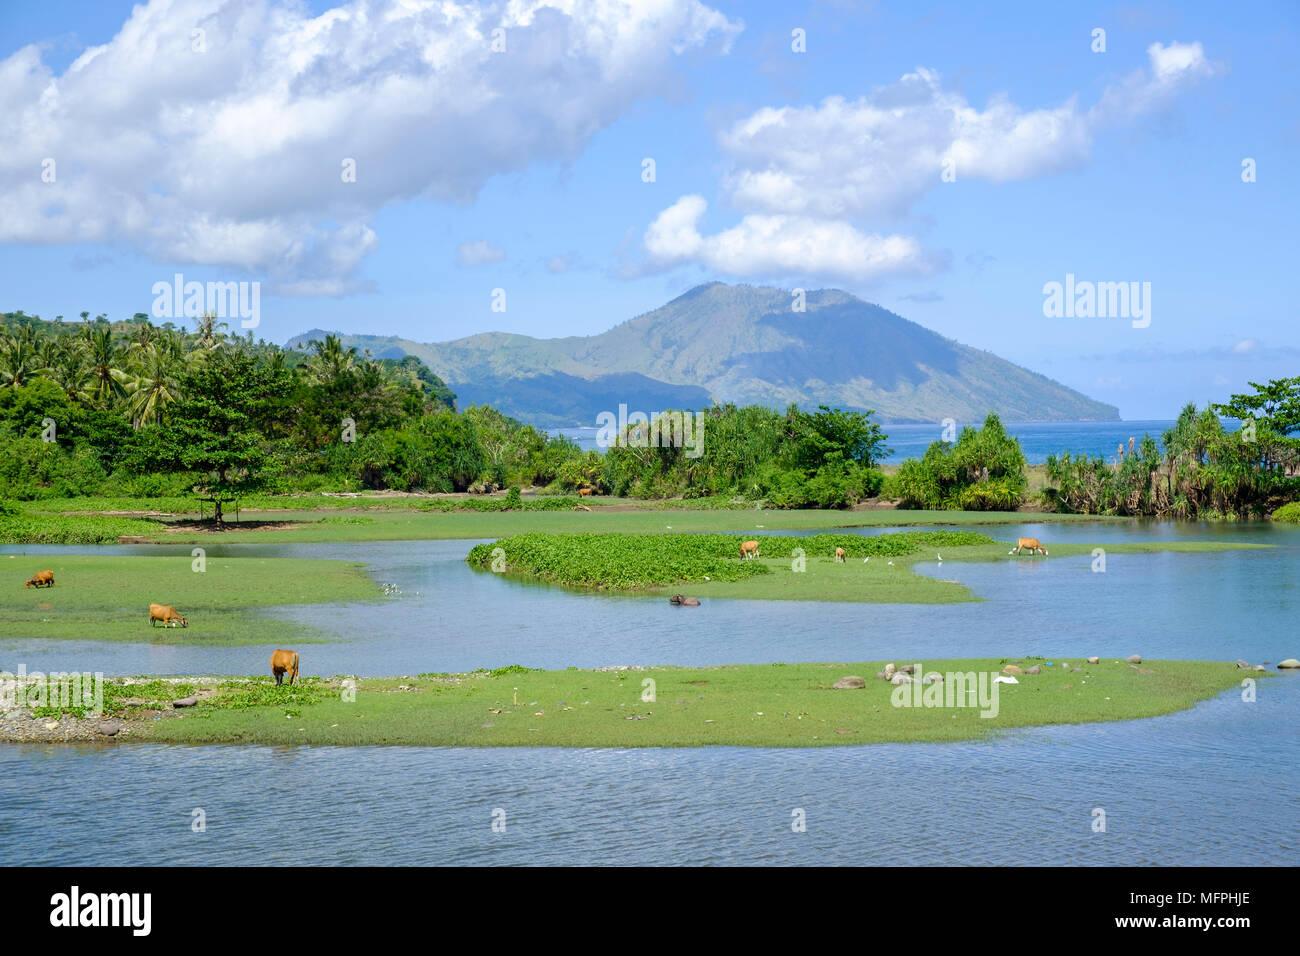 View of Mt. Iya, a volcano, across the Nanga Ba estuary, Ende Regency, Flores Island, Indonesia. - Stock Image